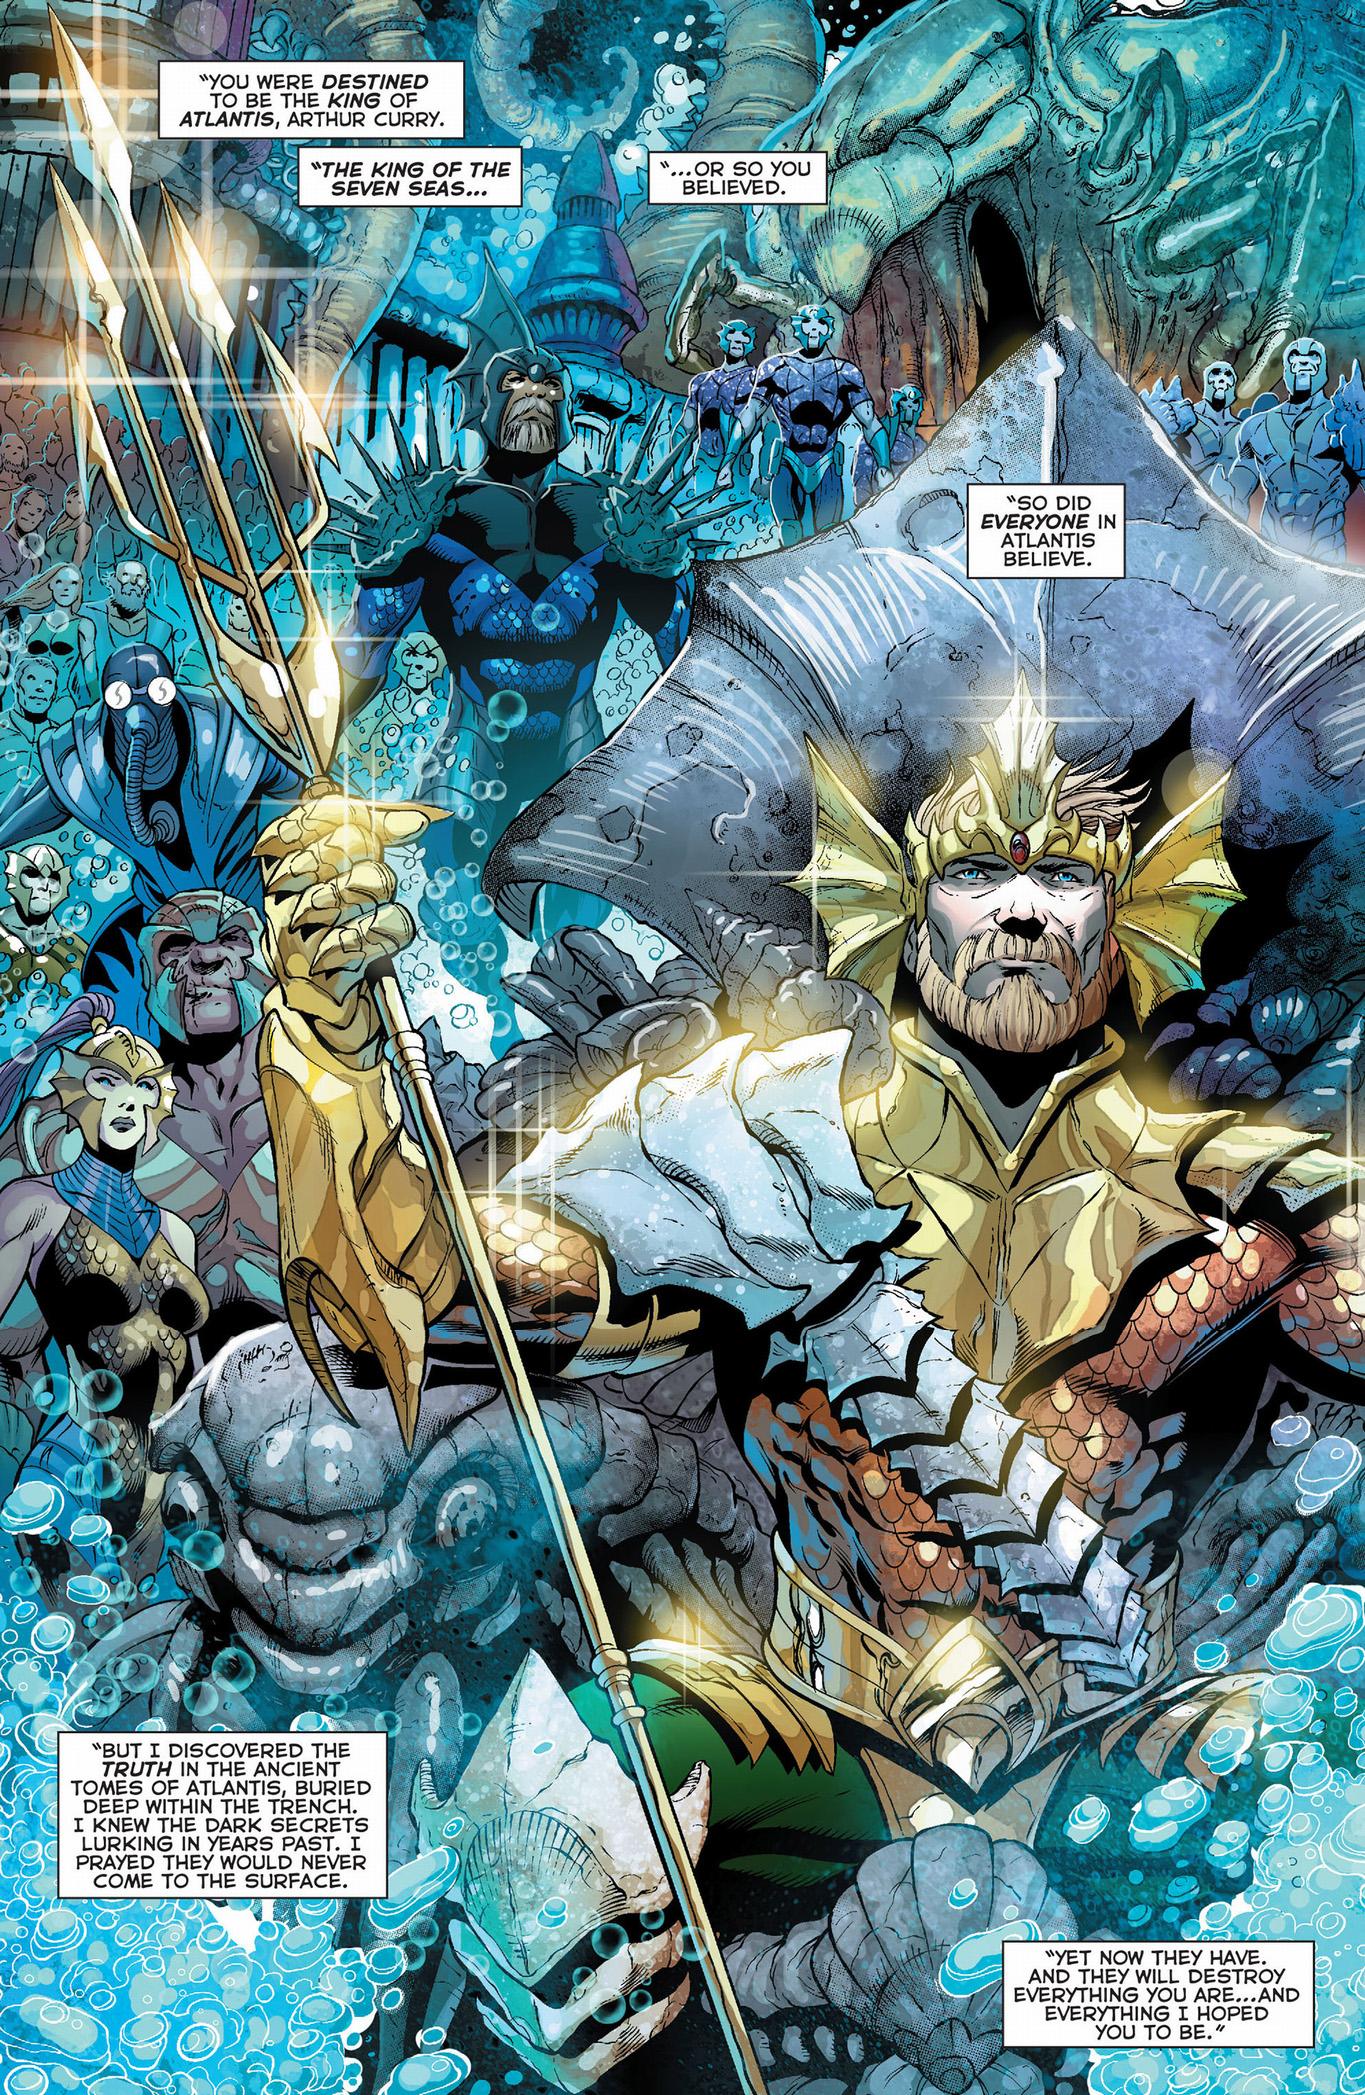 Aquaman King Of The Seven Seas  Comicnewbies